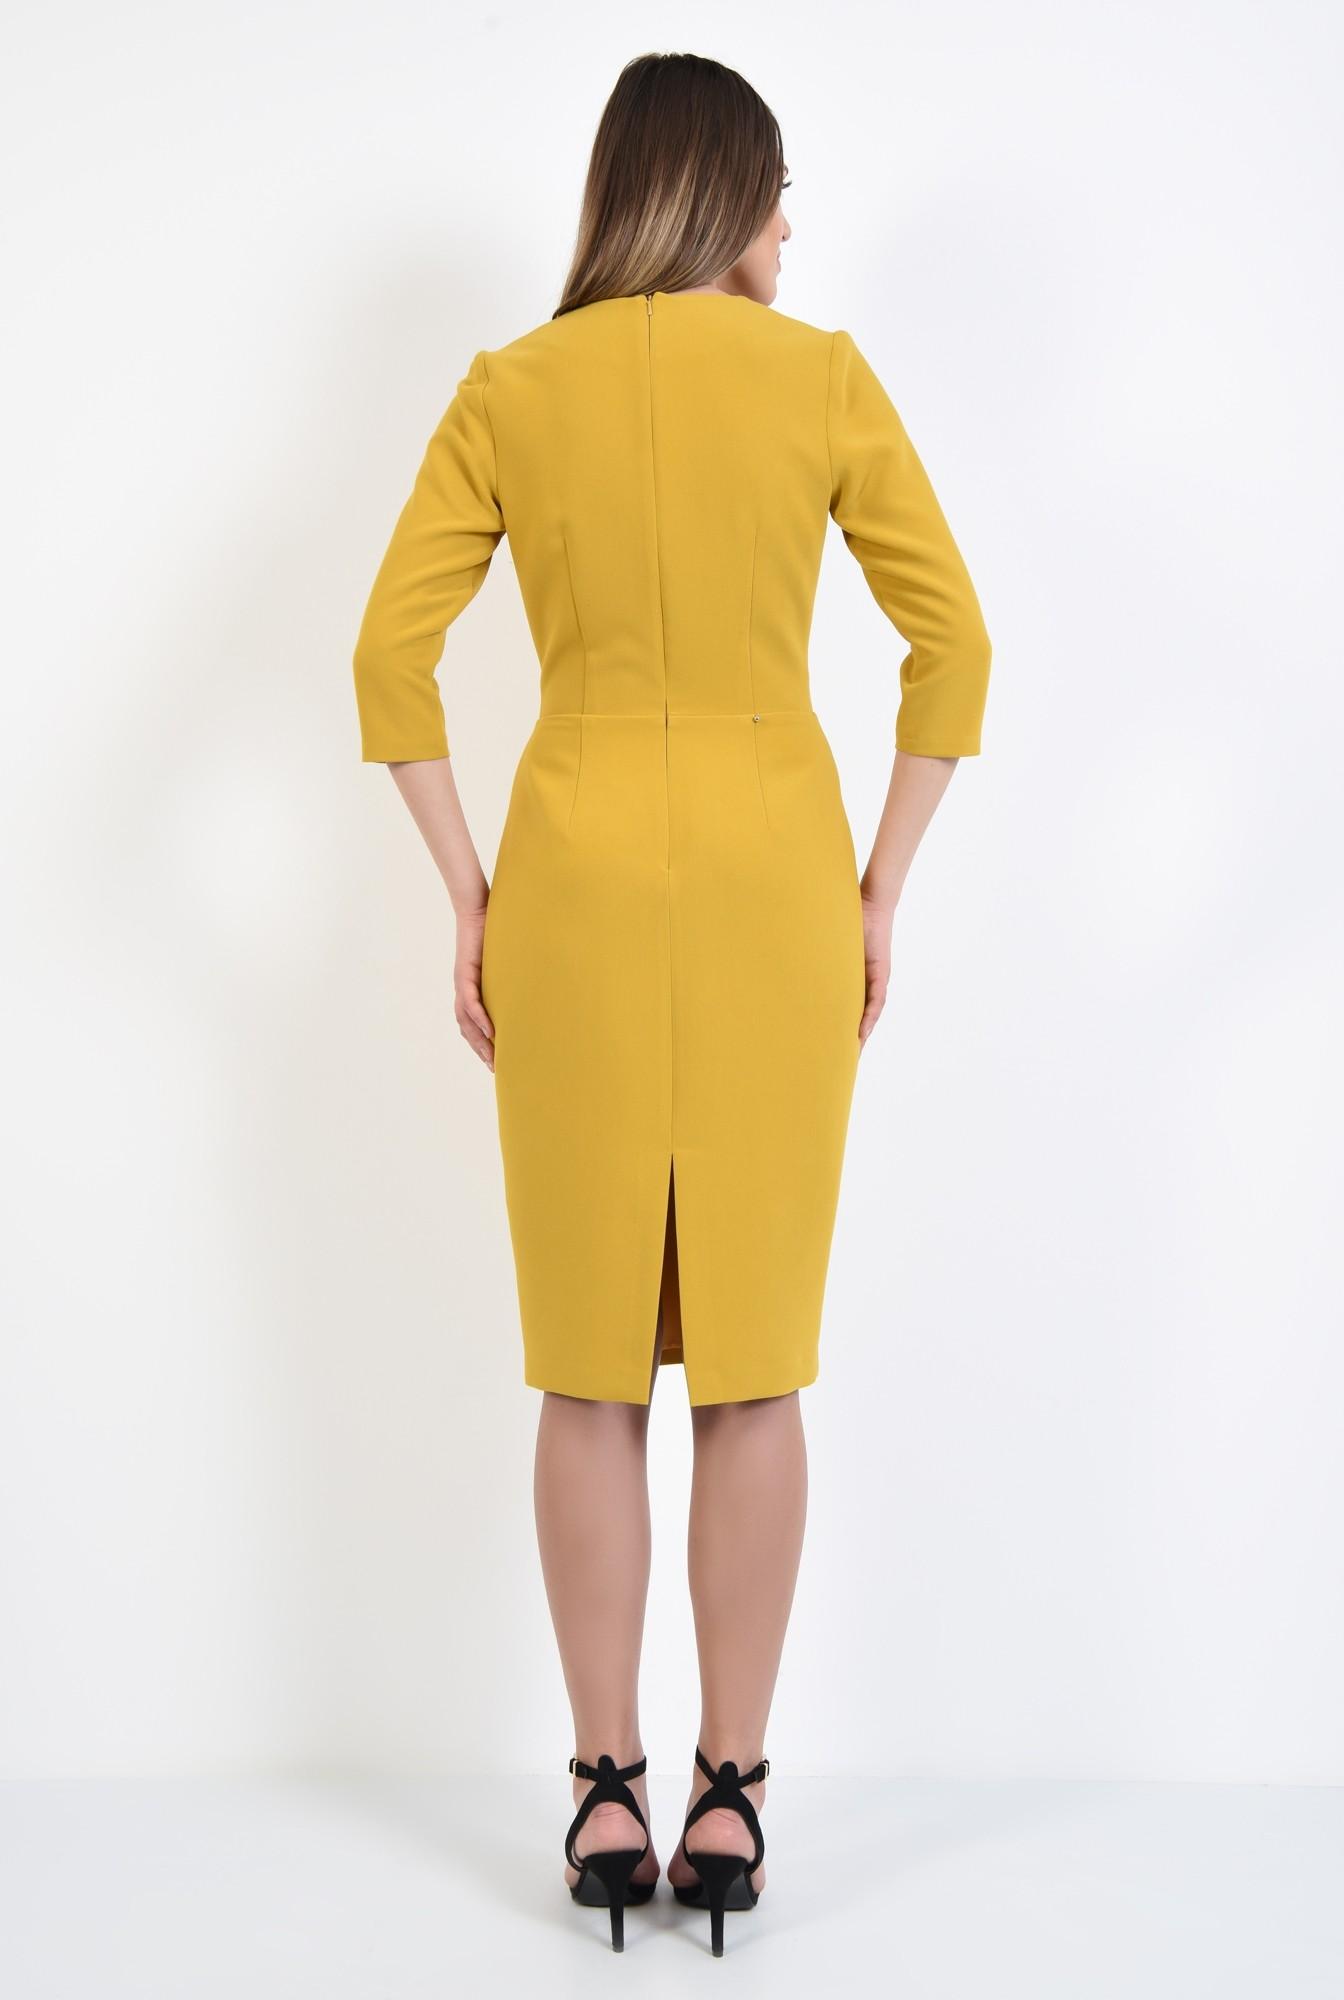 1 - 360 - rochie casual, bodycon, mustar, betelie, nasturi